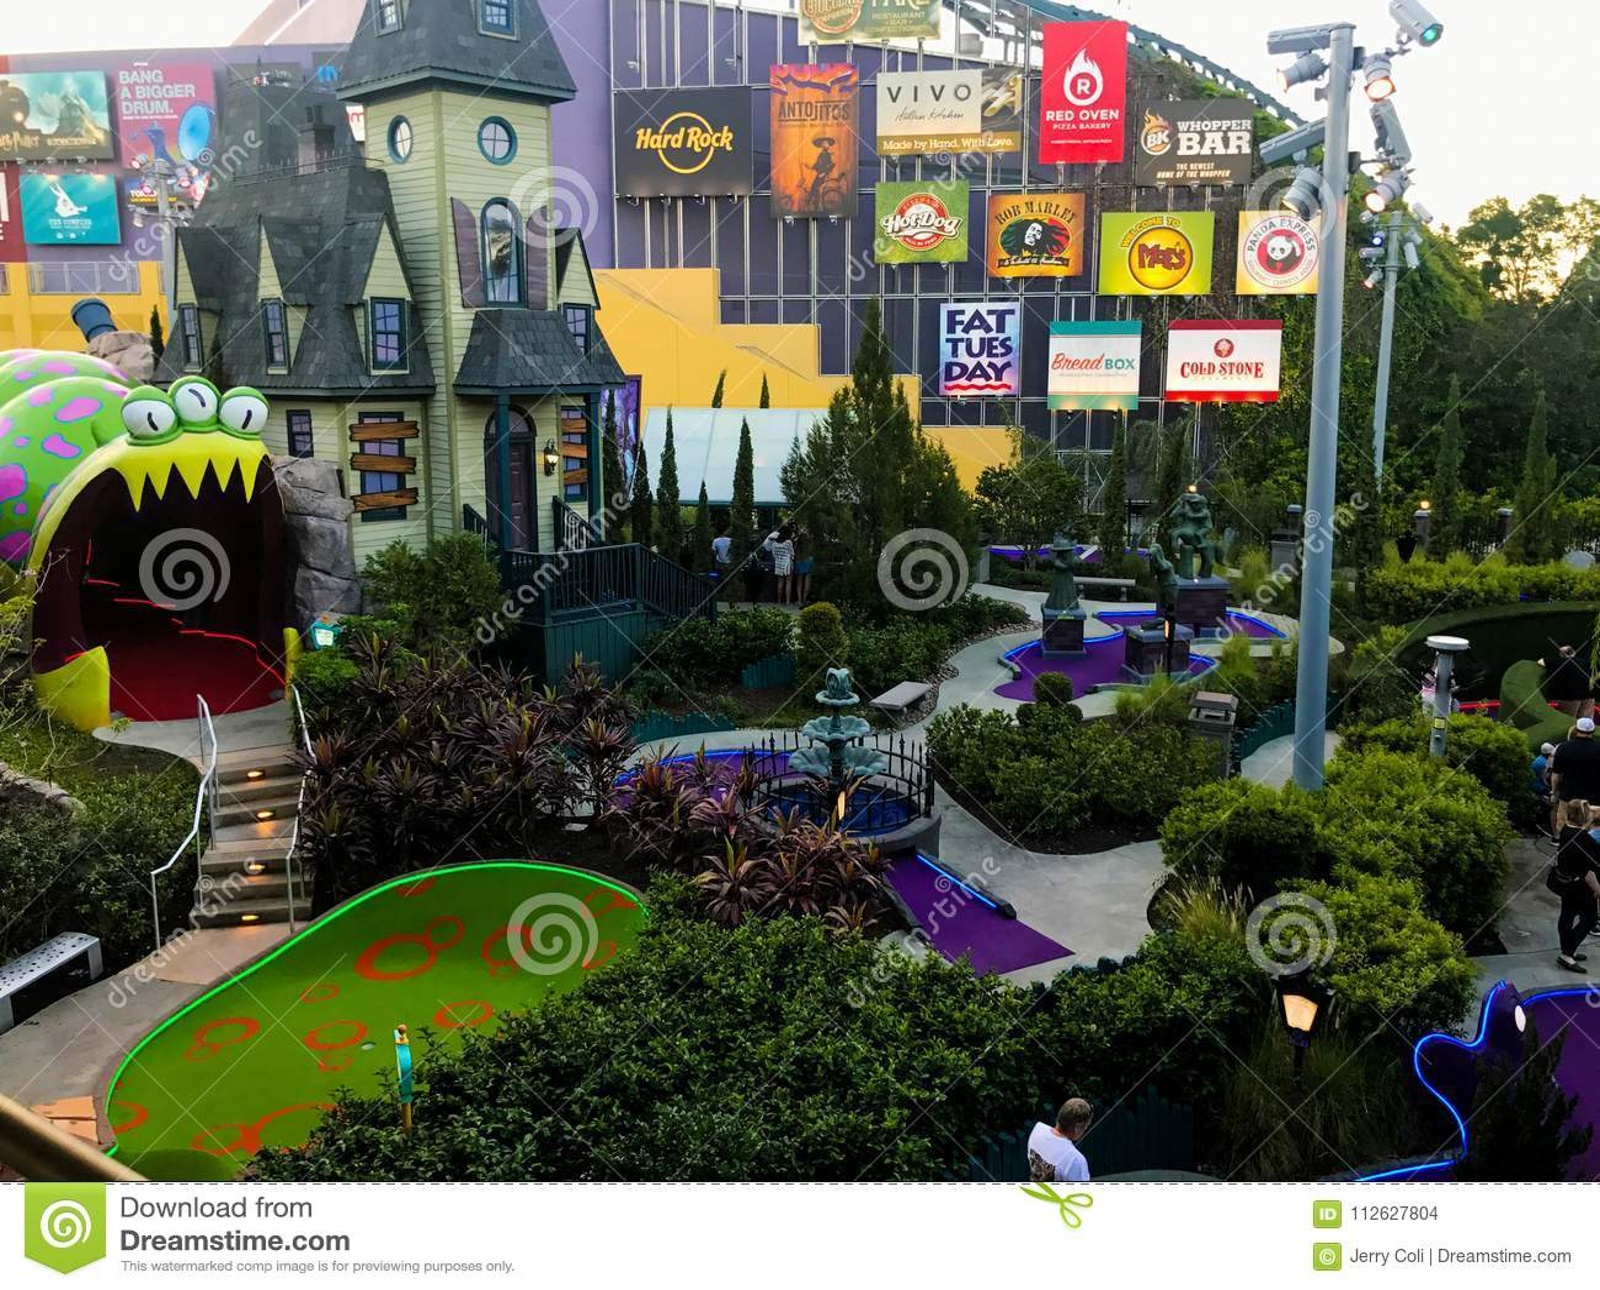 Pet Friendly Hotels Near Universal Studios